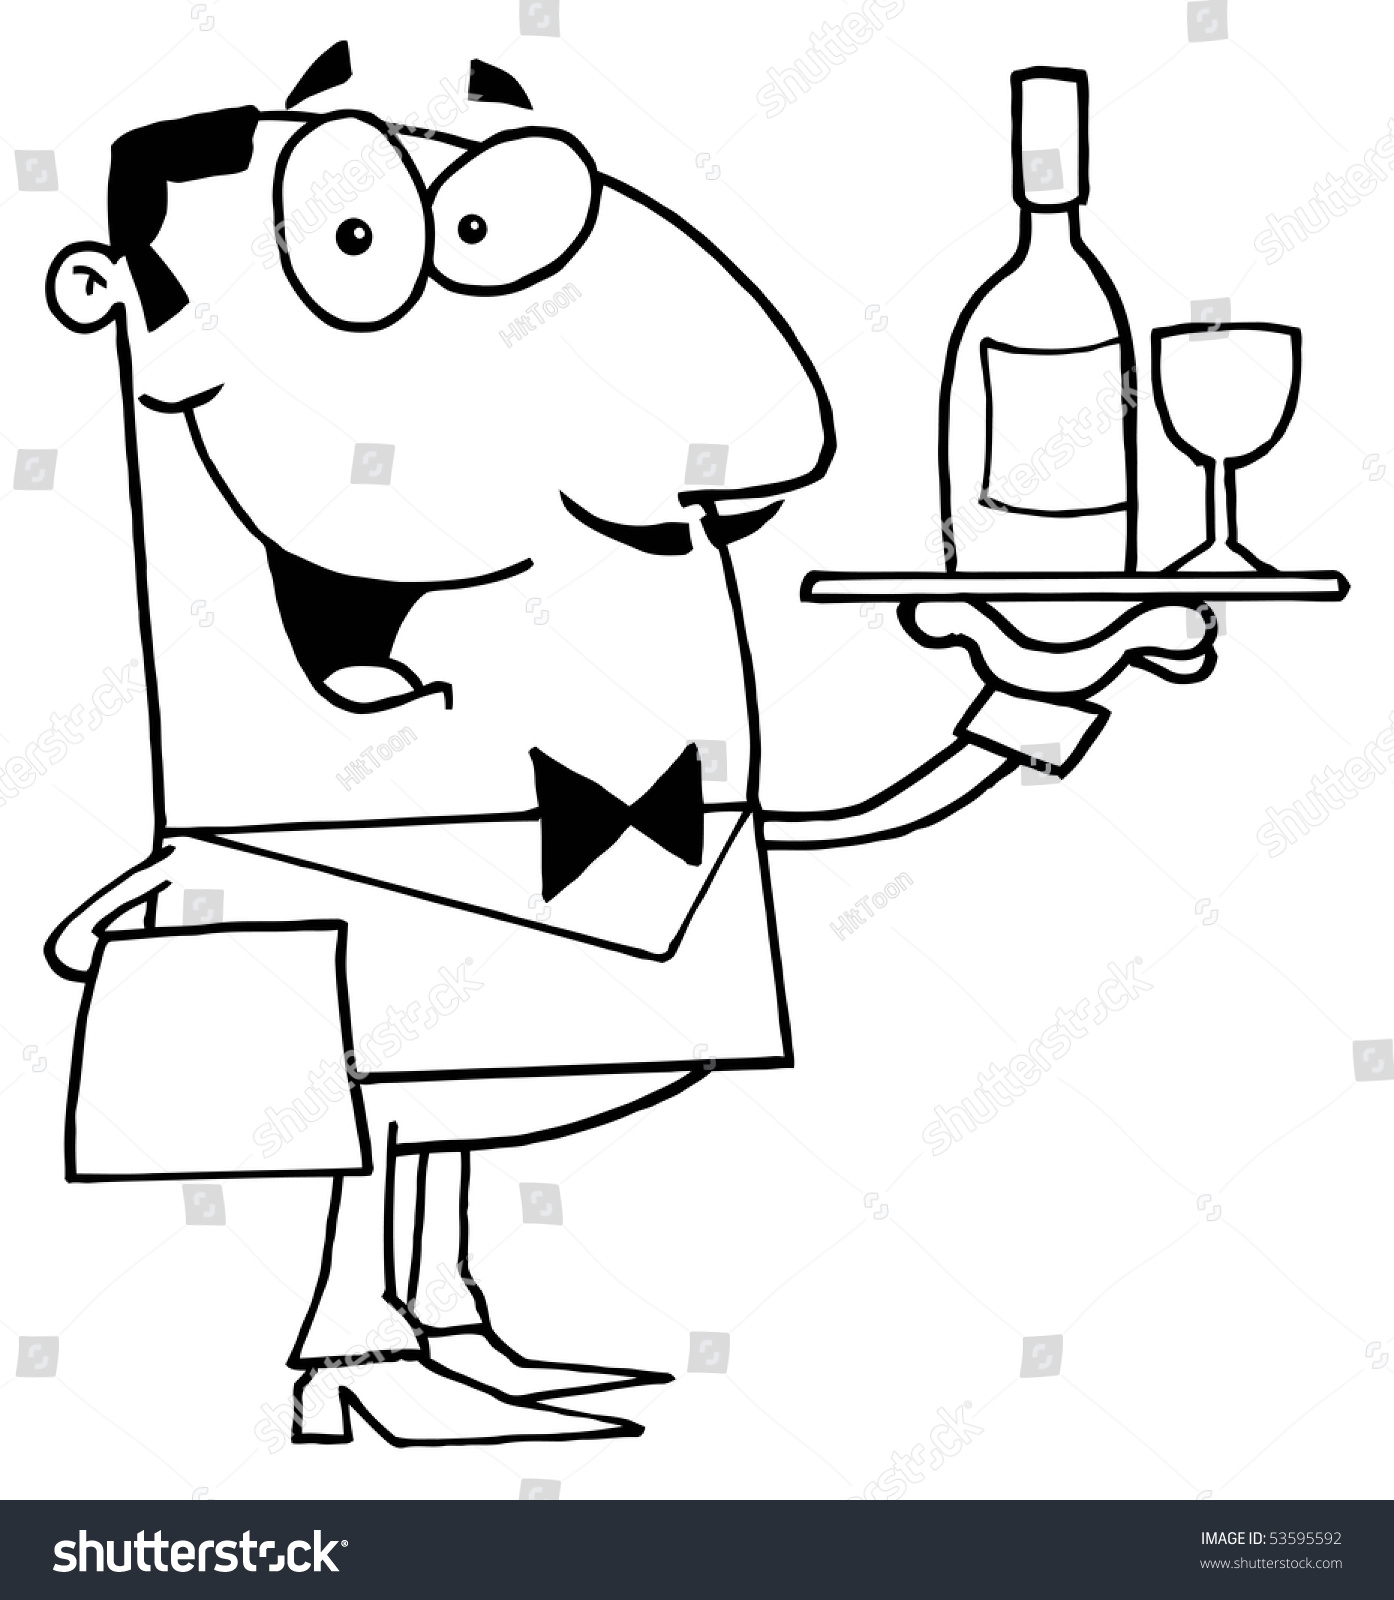 Clipart Illustration Of An Outlined Butler Serving Wine ... Butler Servant Clipart